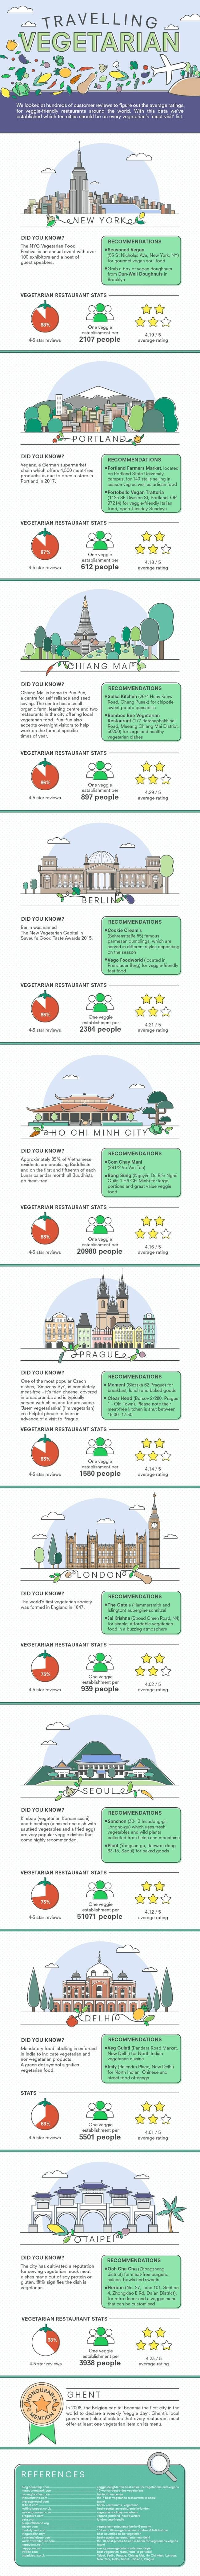 travelling vegetarian infographic